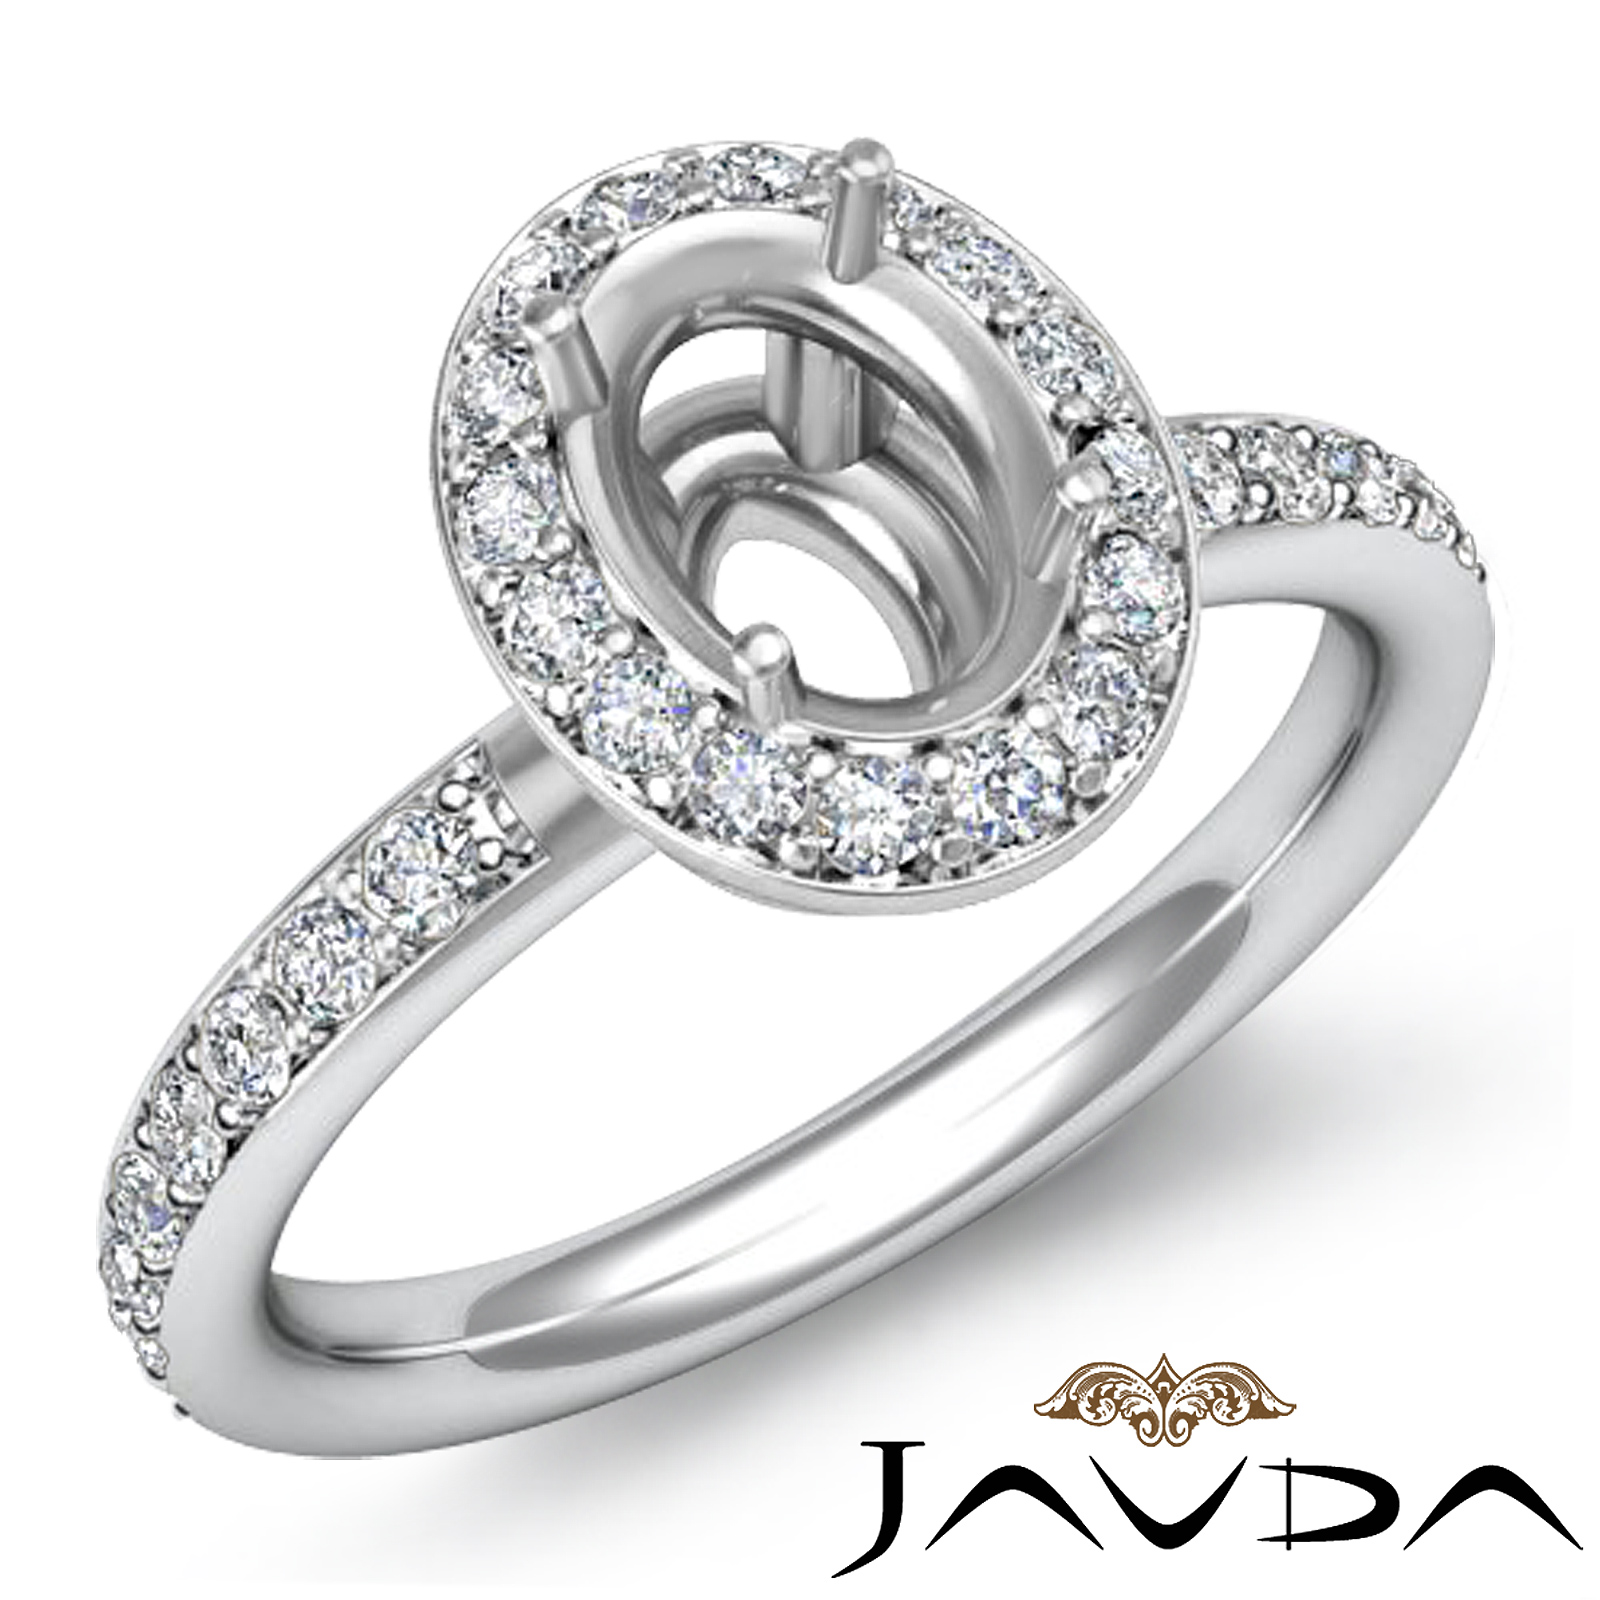 diamond engagement halo pave ring oval shape semi mount 0. Black Bedroom Furniture Sets. Home Design Ideas